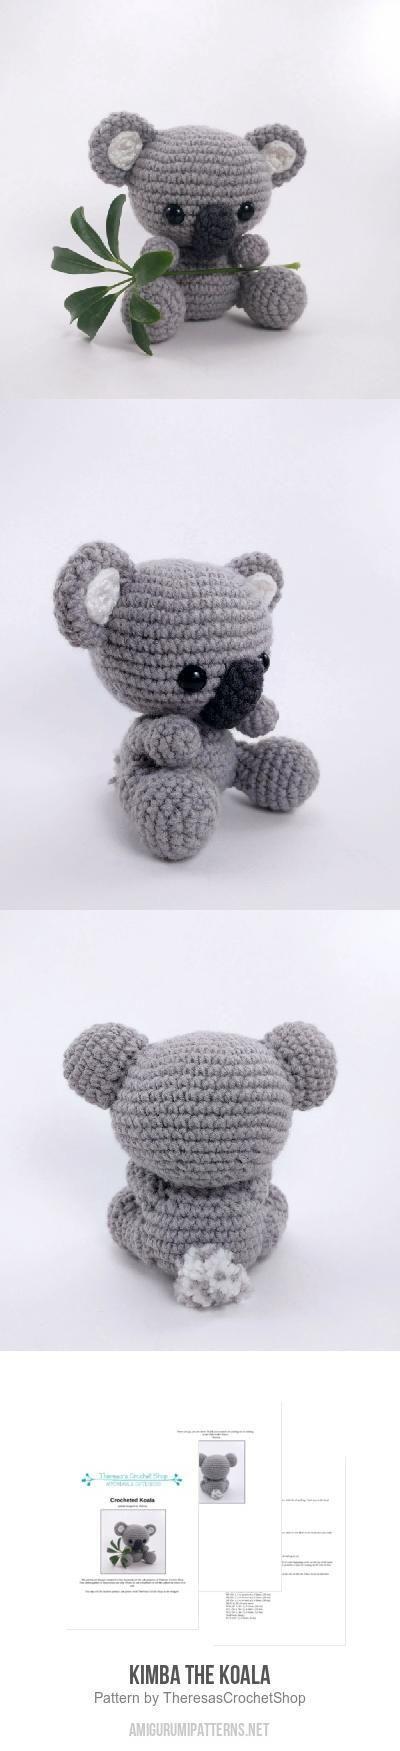 Kimba the Koala amigurumi pattern by Theresas Crochet Shop ...